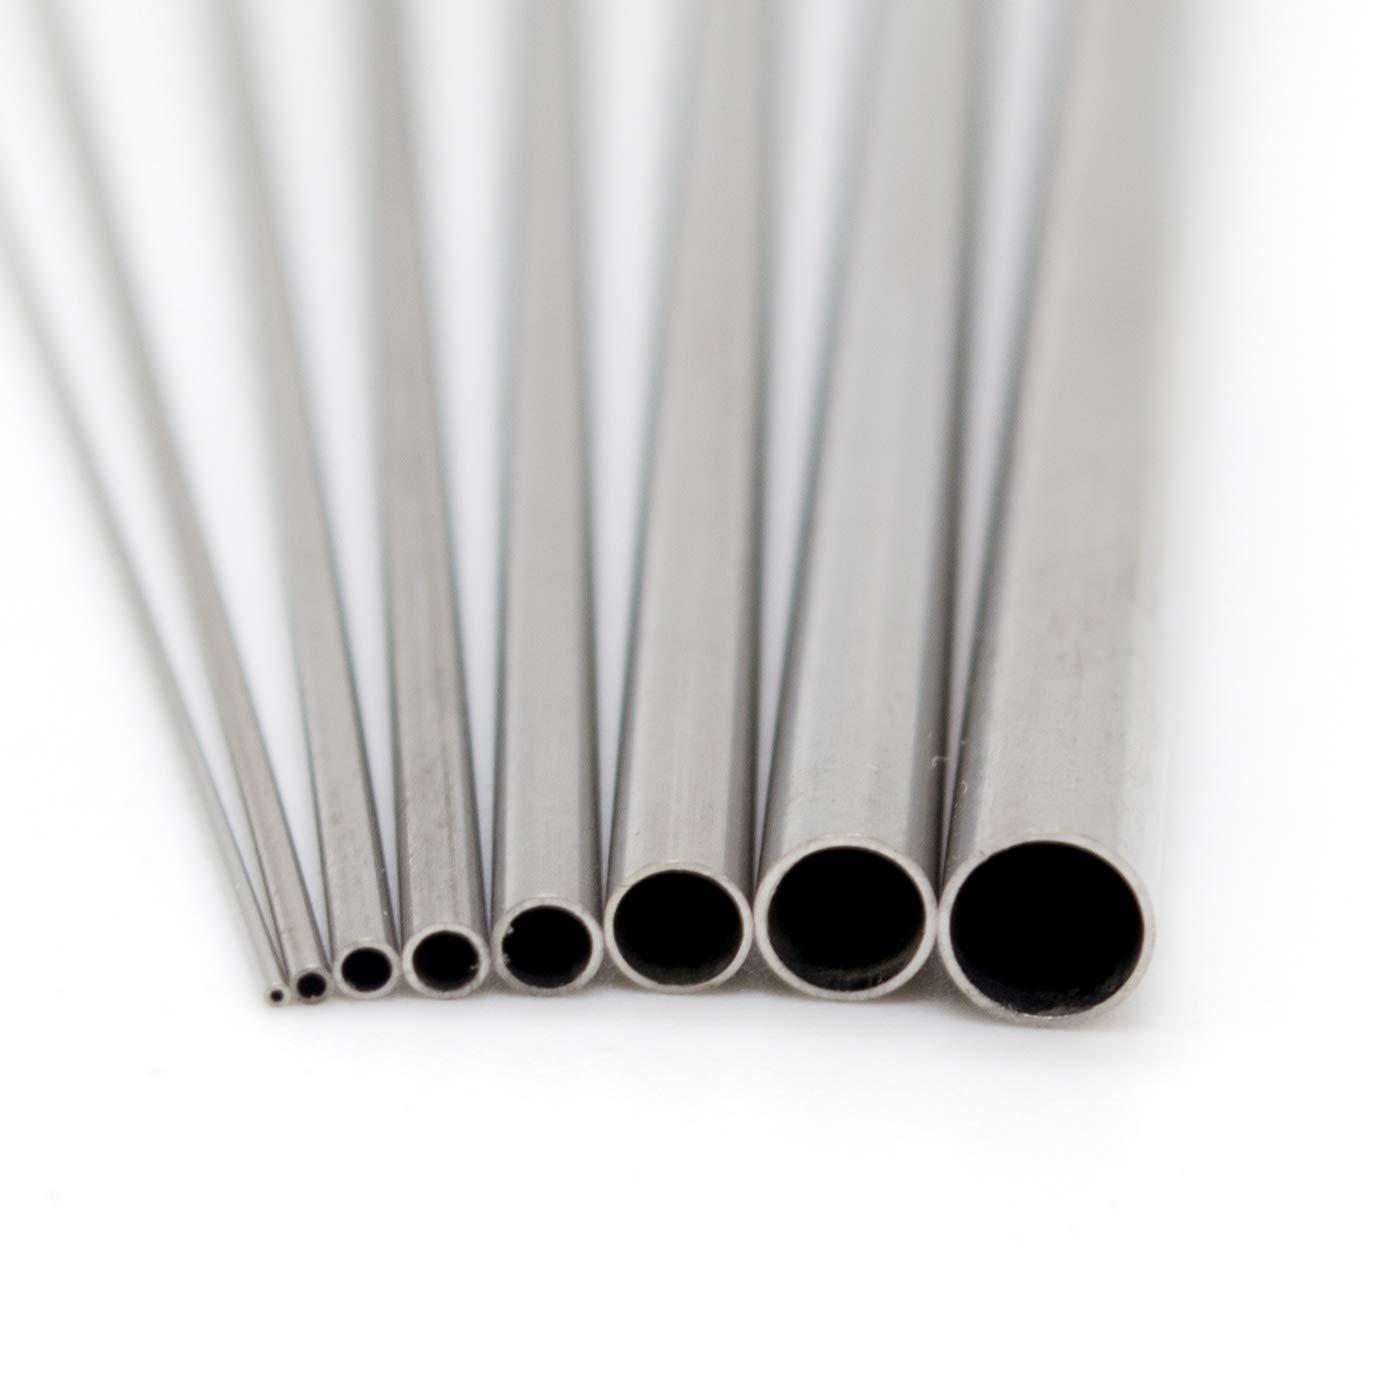 "New 12pcs 1//2/"" 12Ga Blunt Stainless Steel Syringe Needle tips"